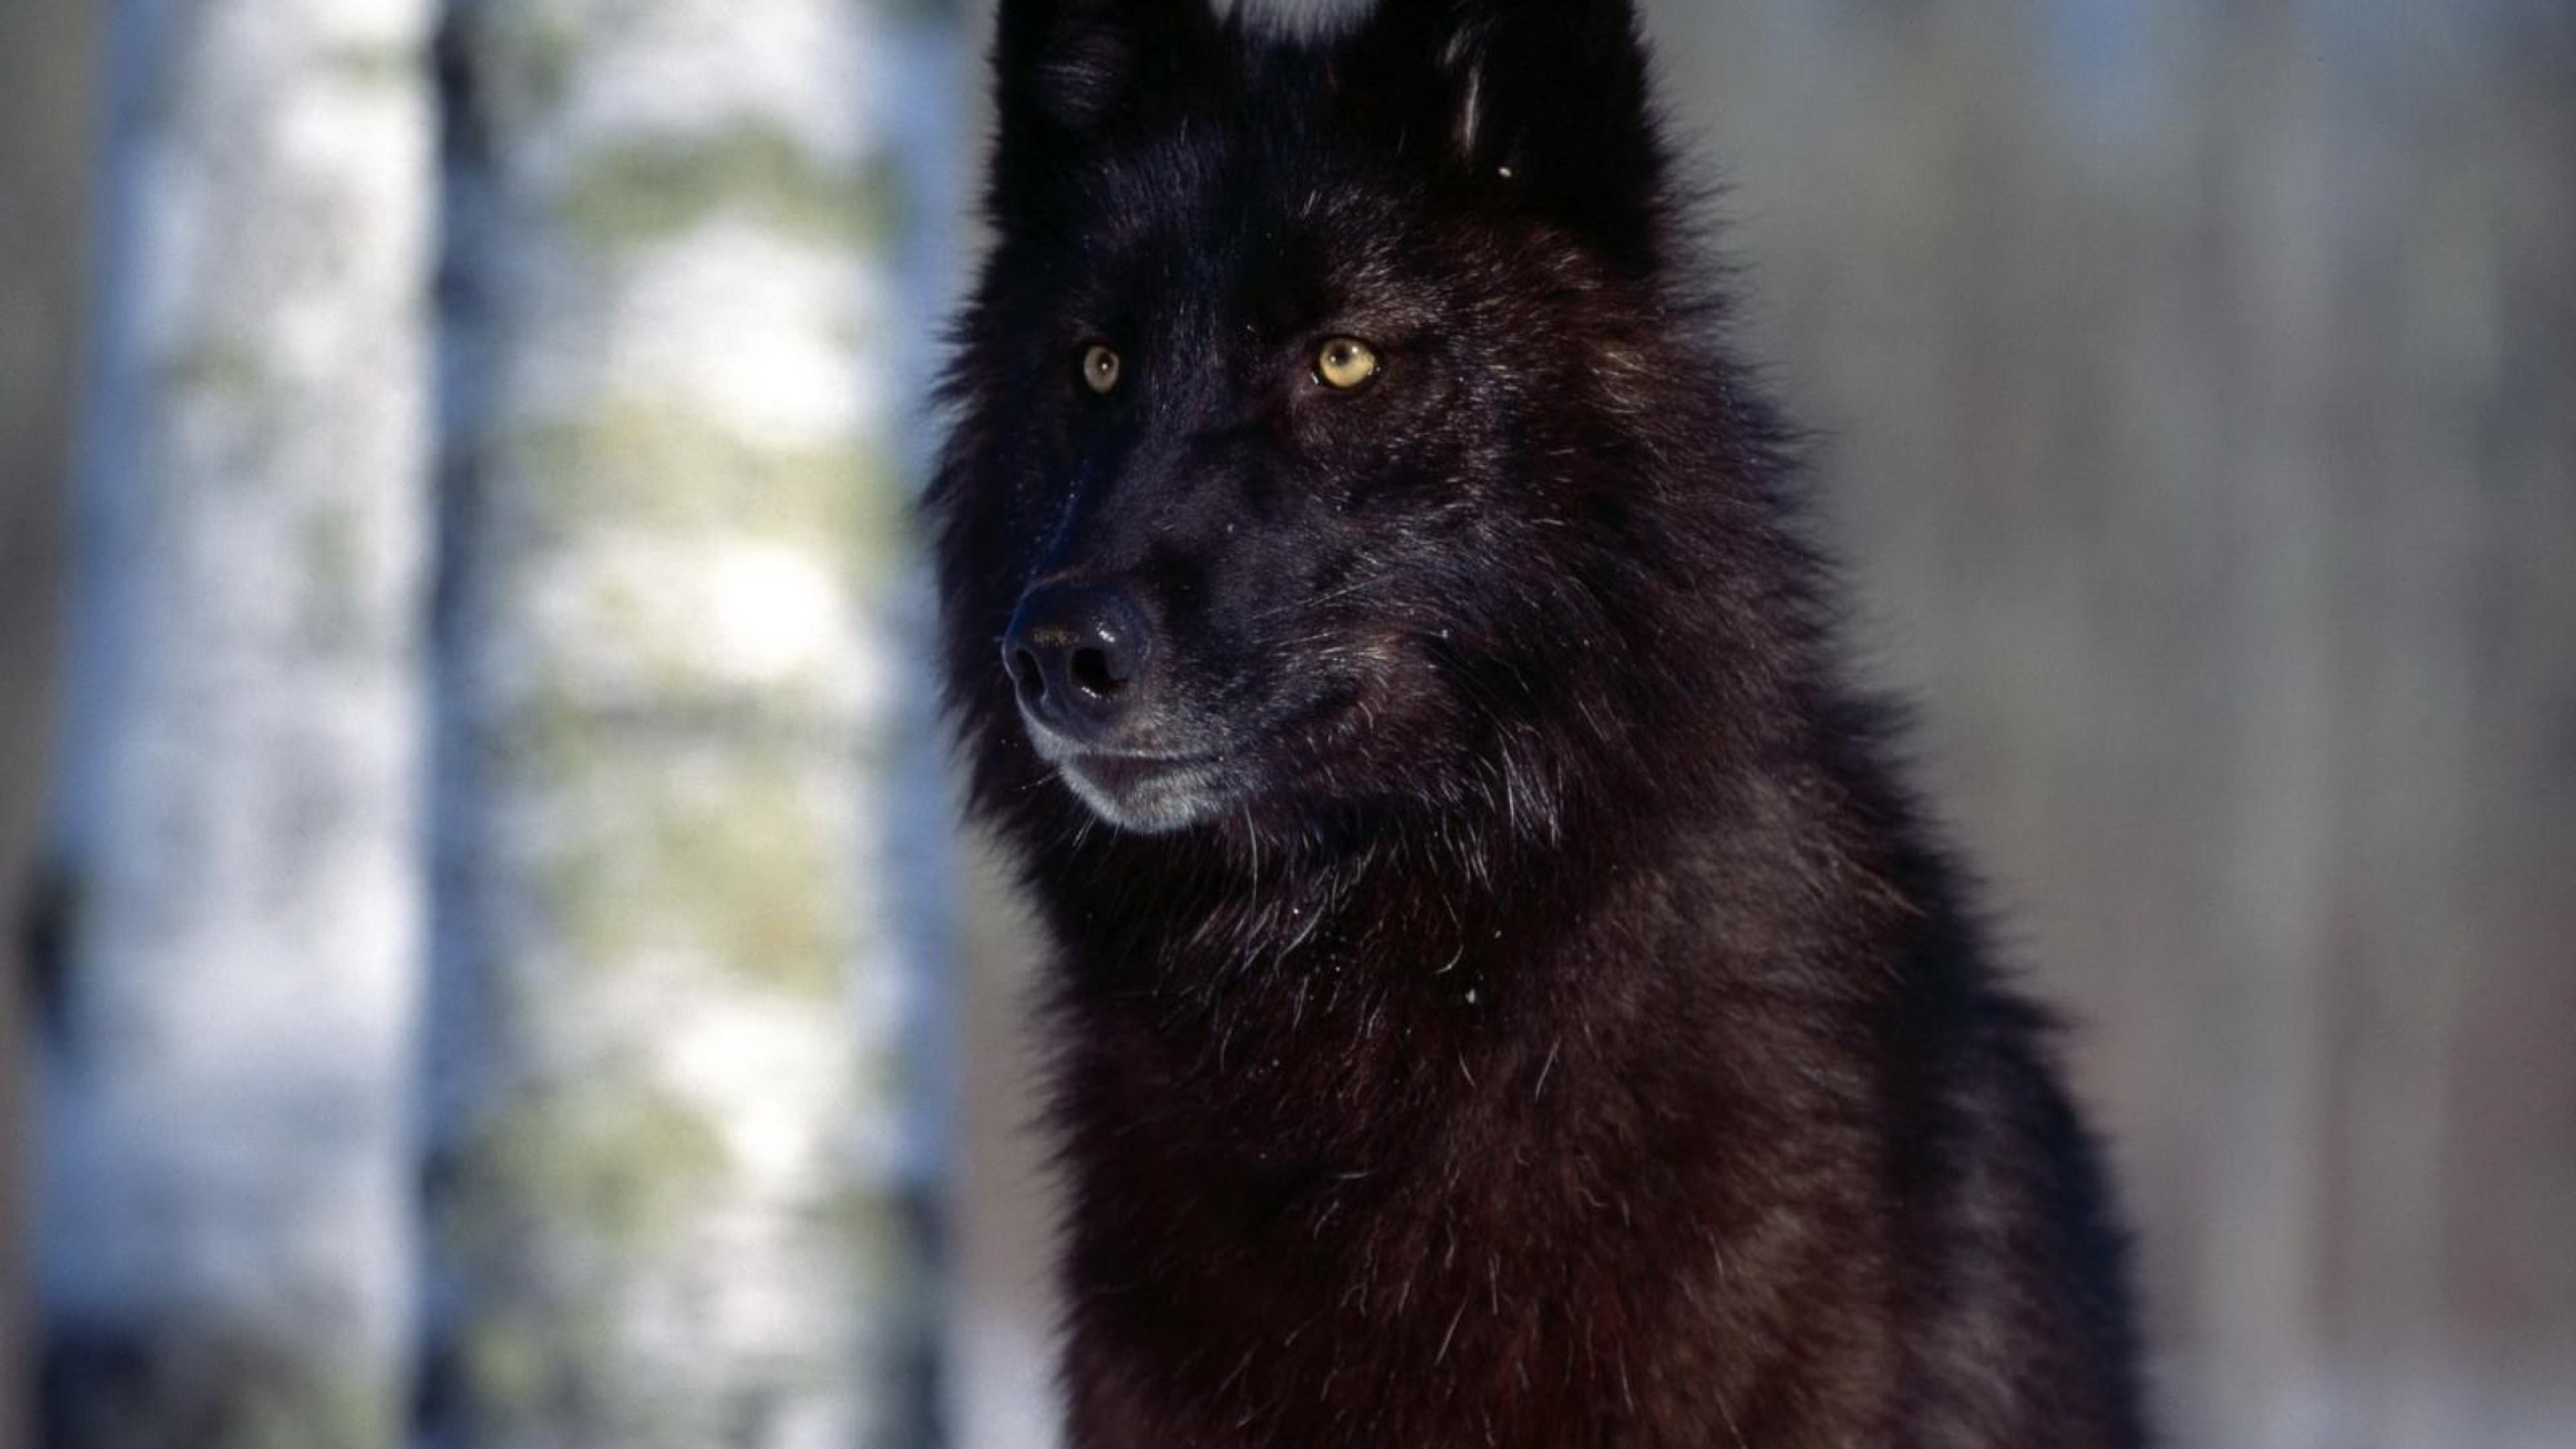 black wolf wallpaper hd wallpaper 4k uhdtv resolution - wallpapers